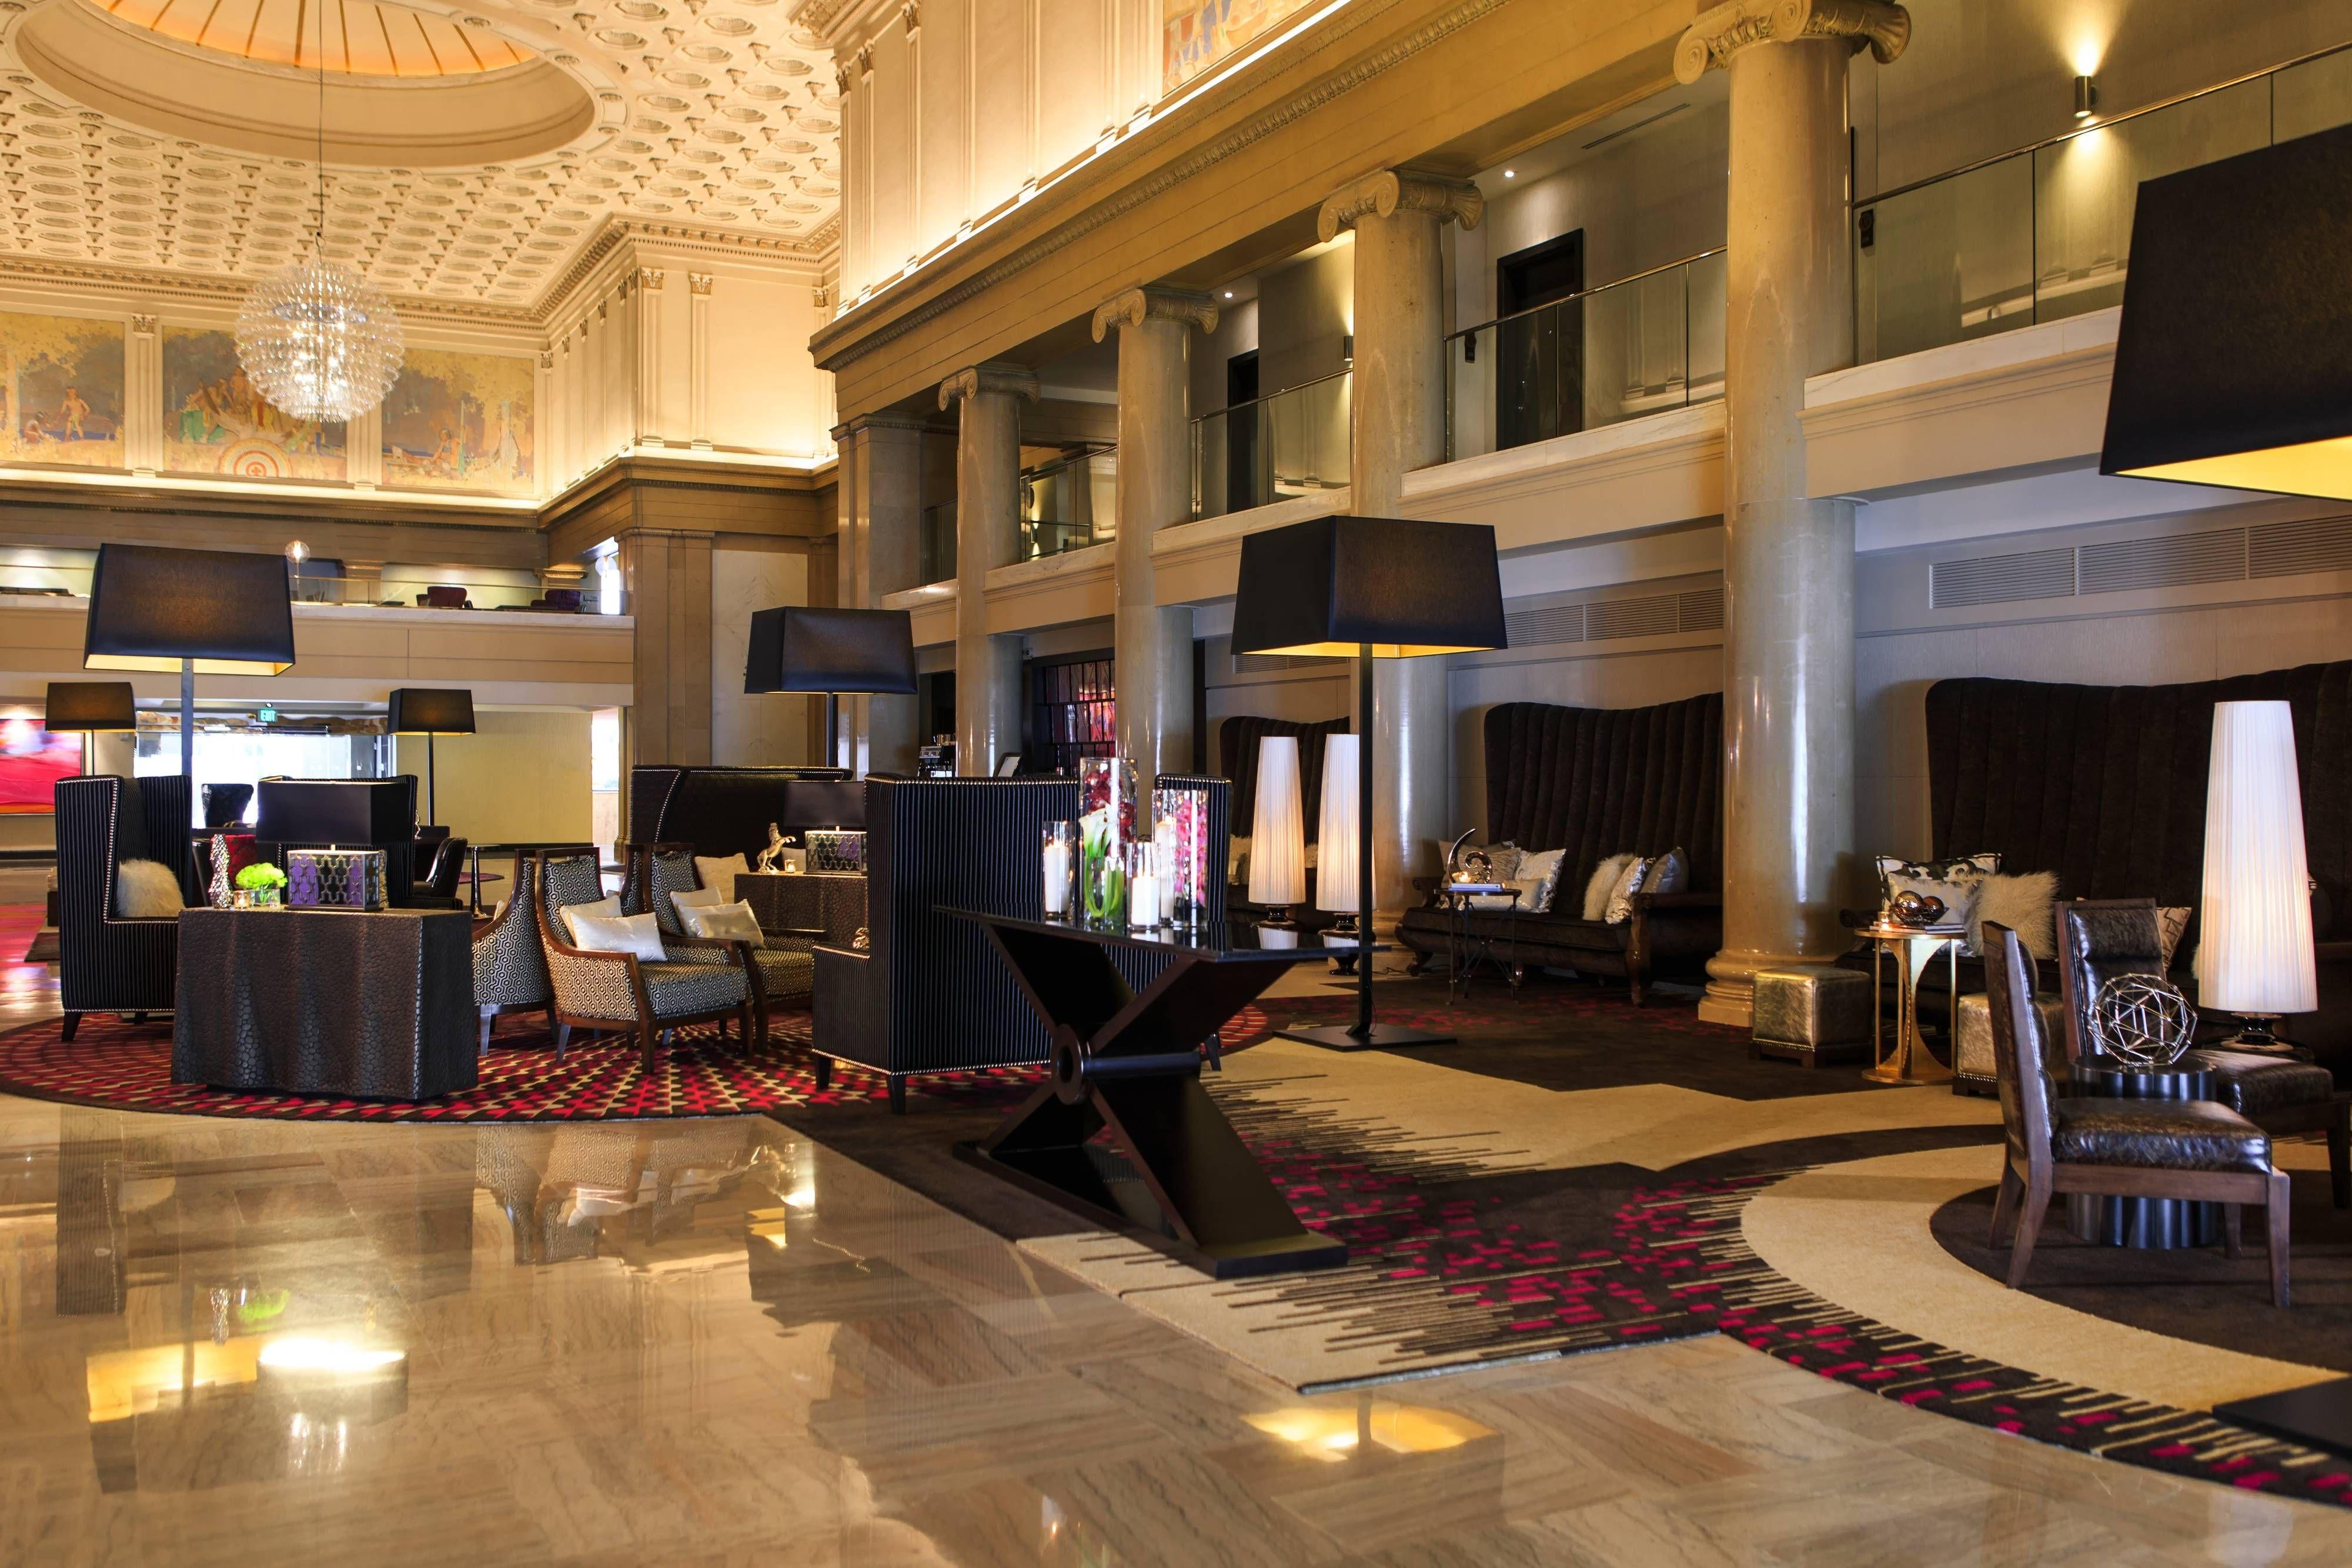 Renaissance Denver Downtown City Center Hotel Lobby Seating Area Happy Hotels Holidays Denver Hotels City Center Hotels Hotel